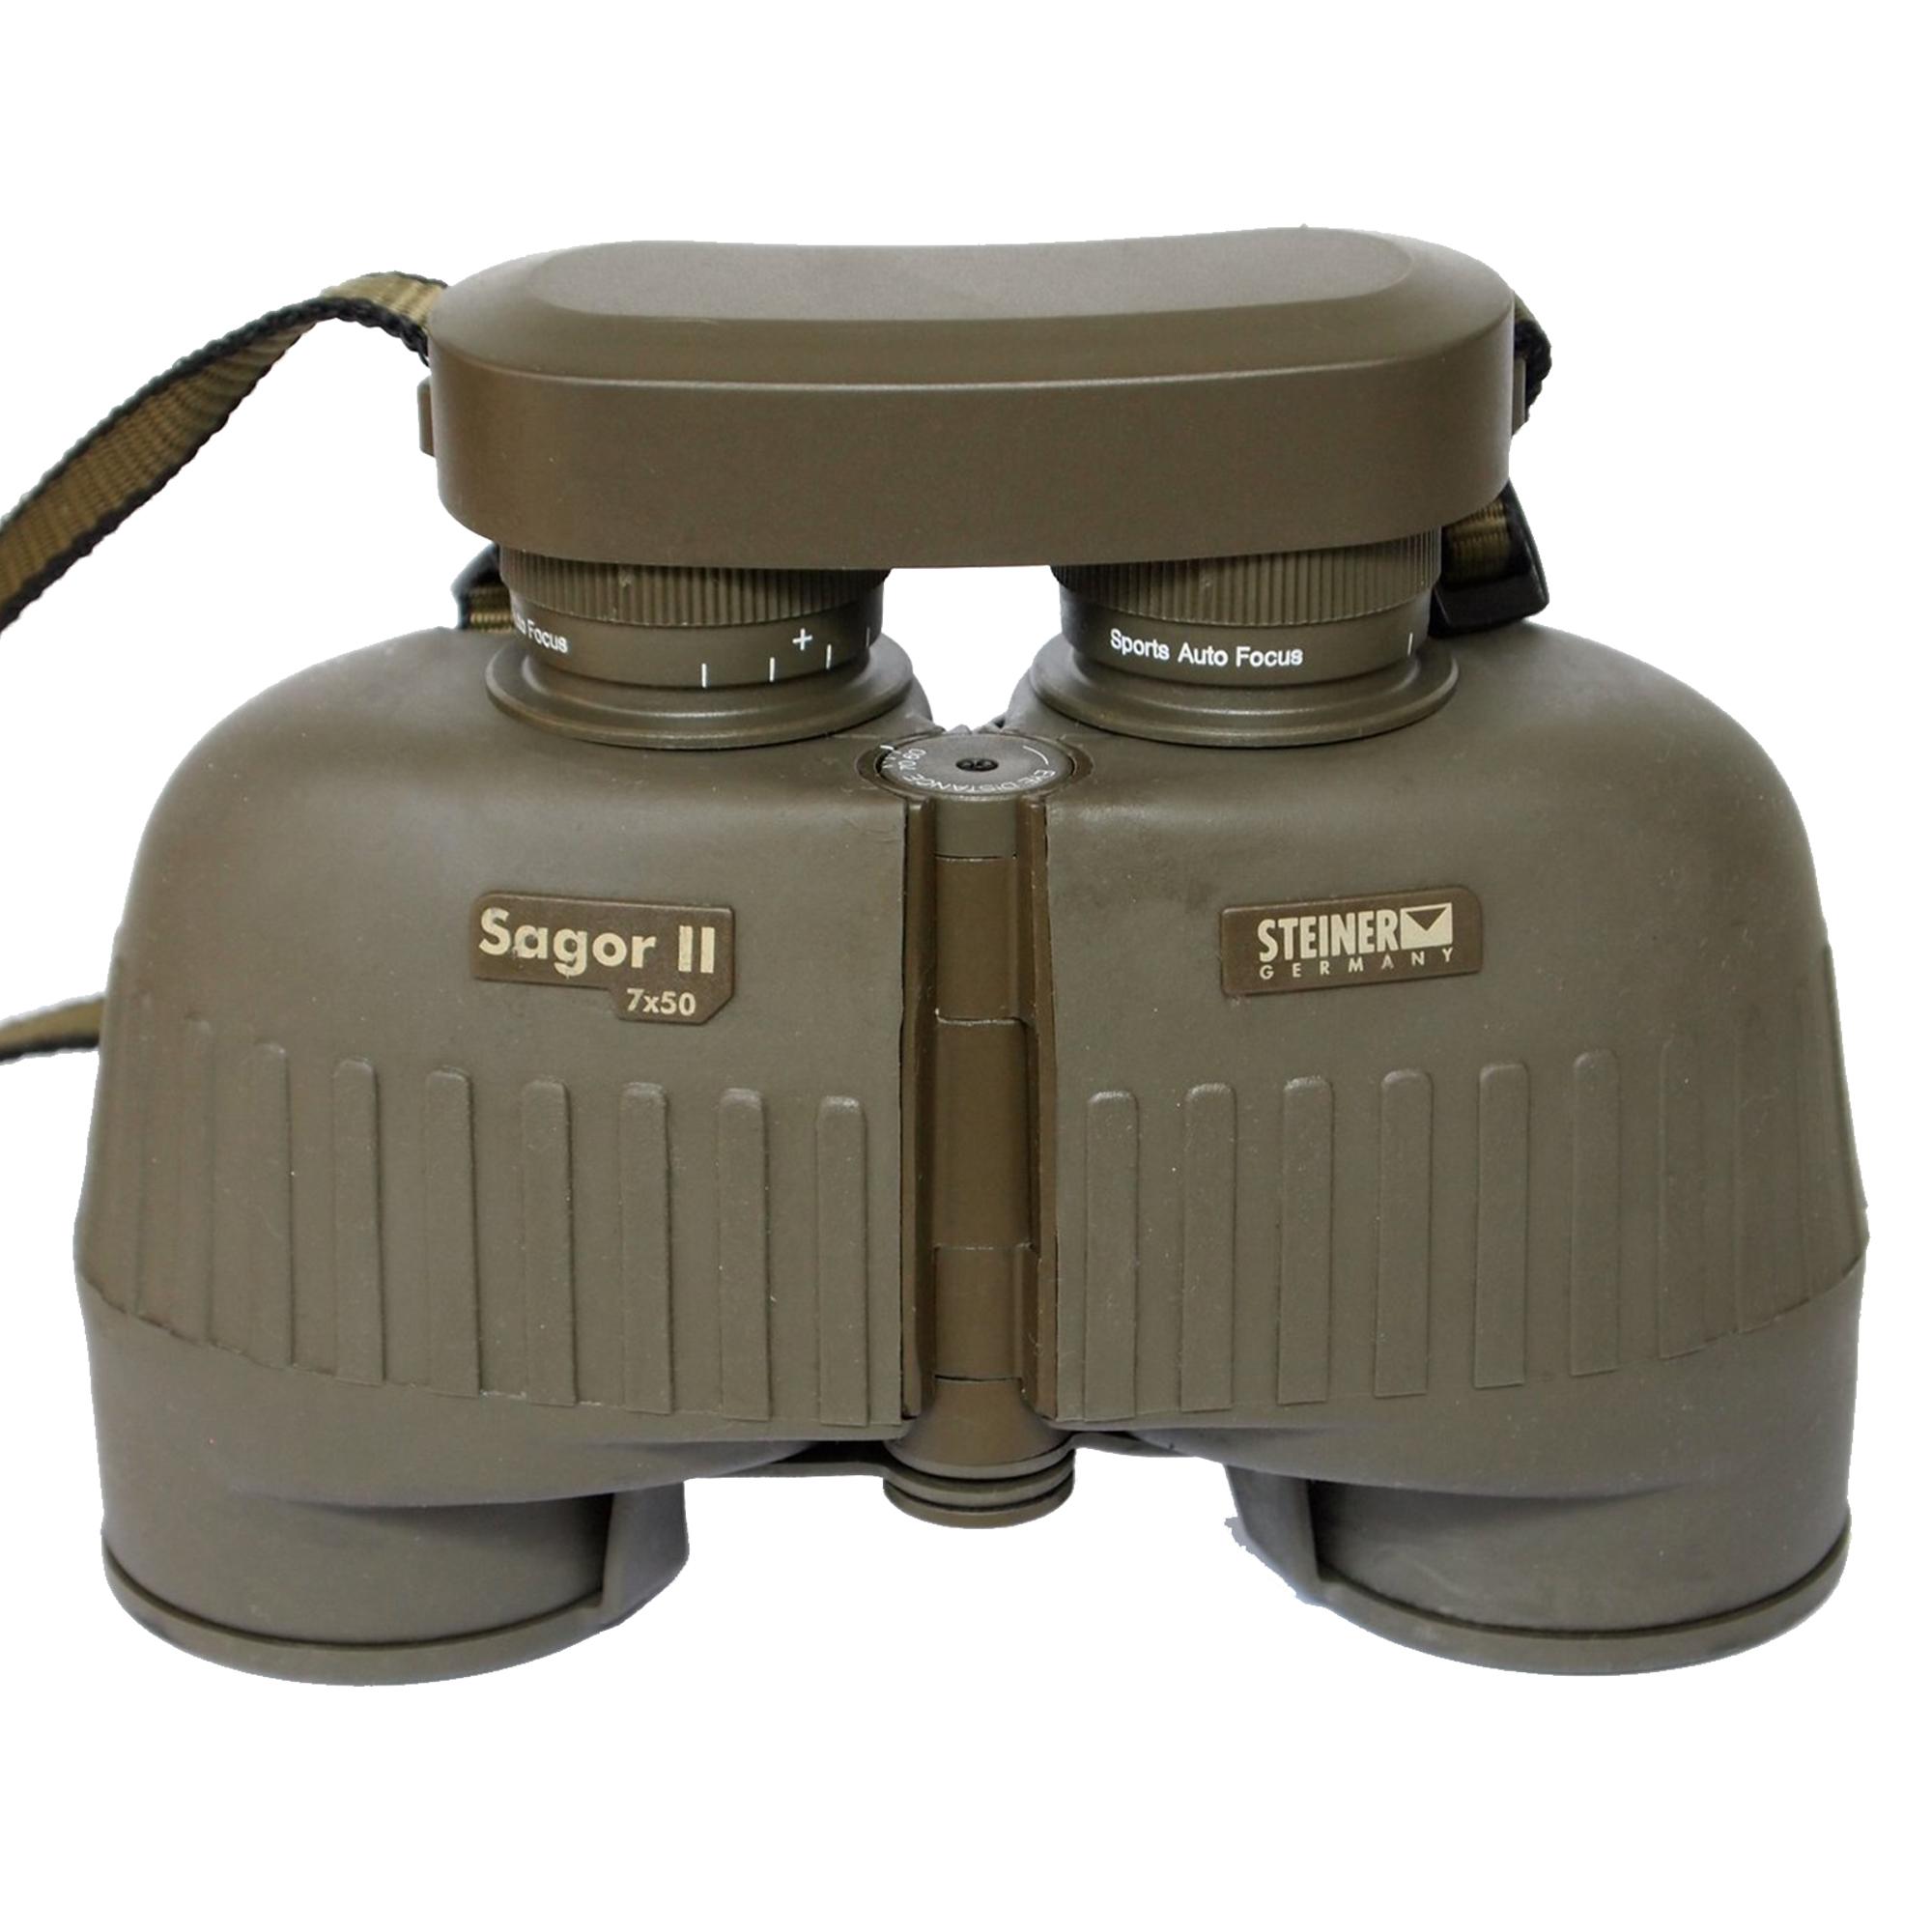 STEINER 7X50 SAGOR II BINOCULAR (out of stock)